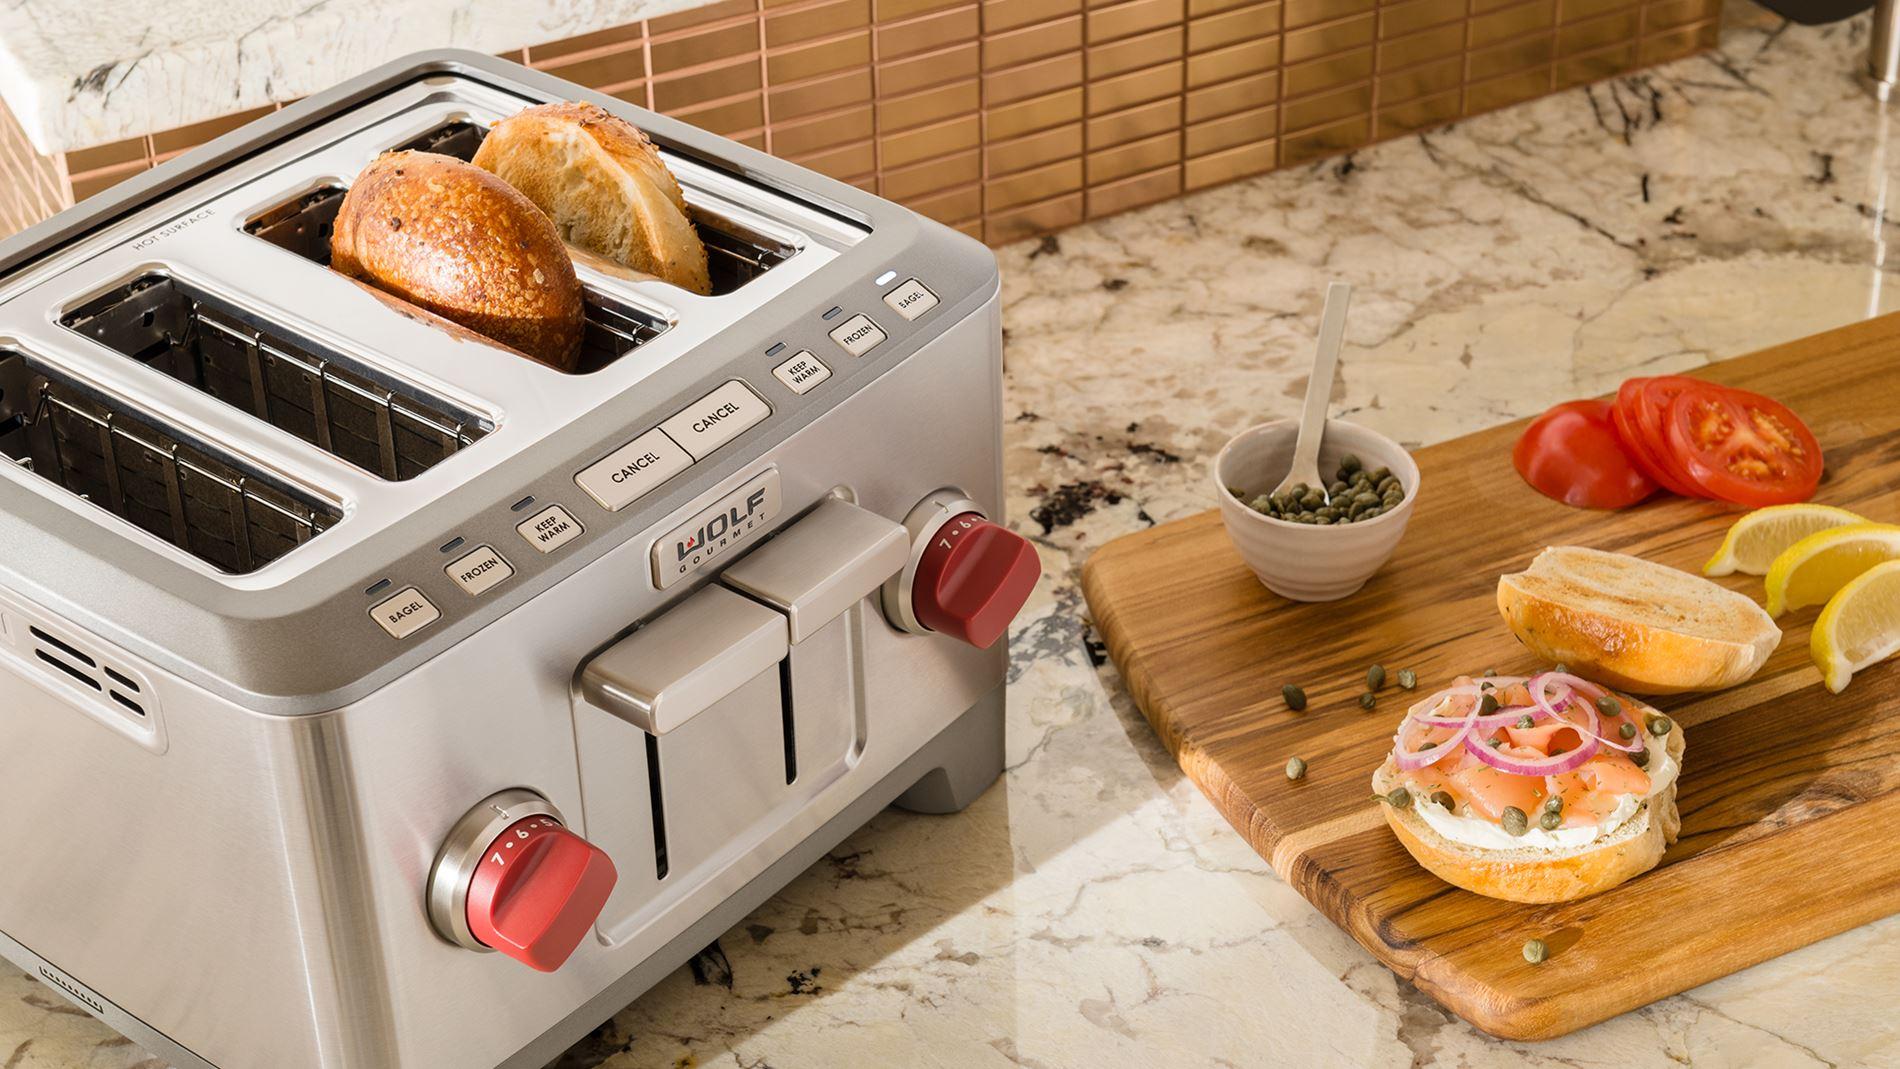 Wolf toaster countertop